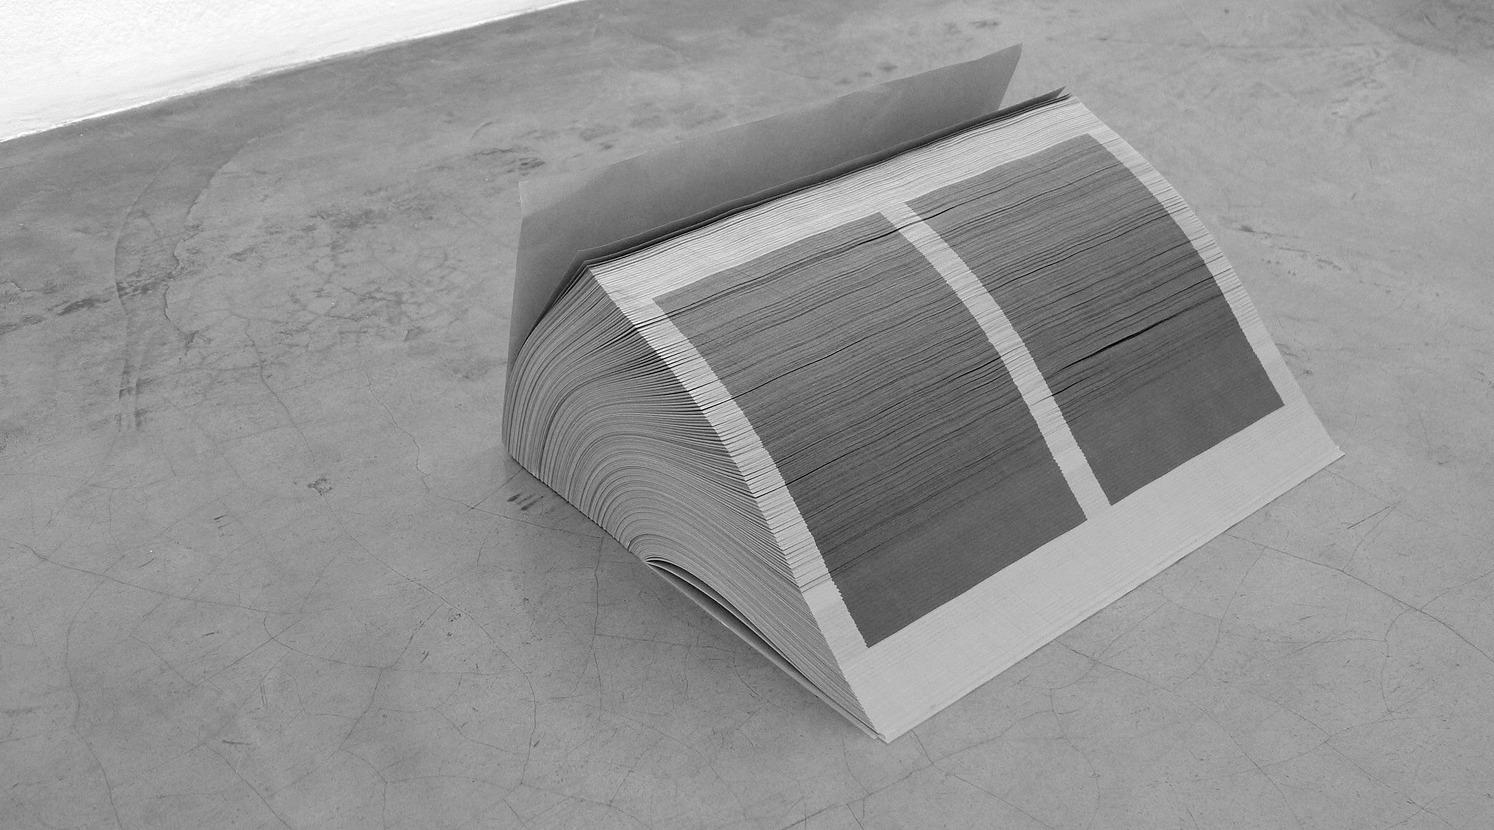 Design: João Loureiro joaoloure - minimalist | ello